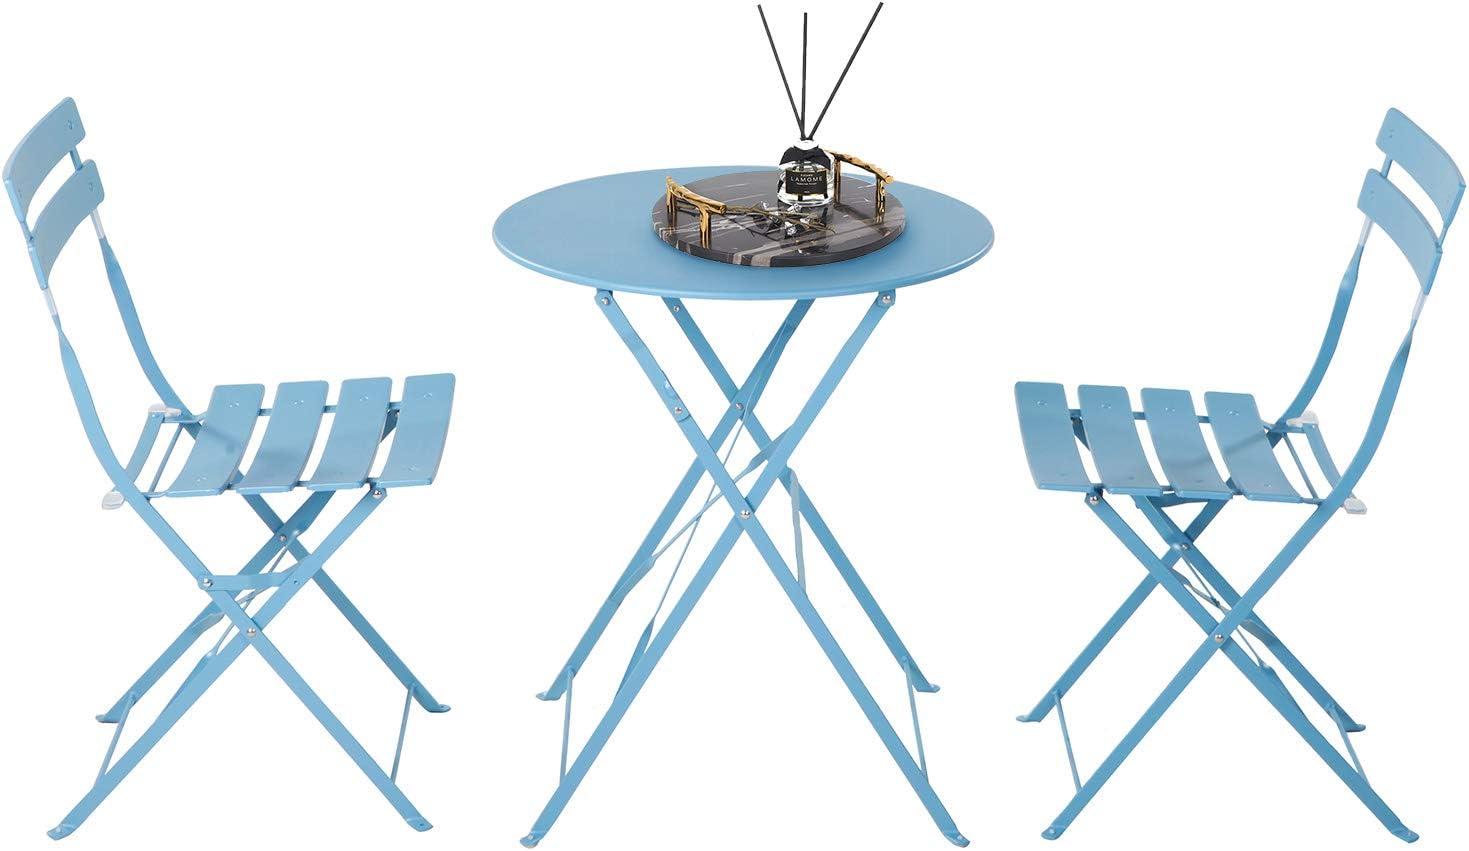 Grand Patio 3pc Metal Folding Bistro Set 2 Chairs And 1 Table Weather Resistant Outdoor Indoor Conversation Set For Patio Yard Garden Blue Garden Outdoor